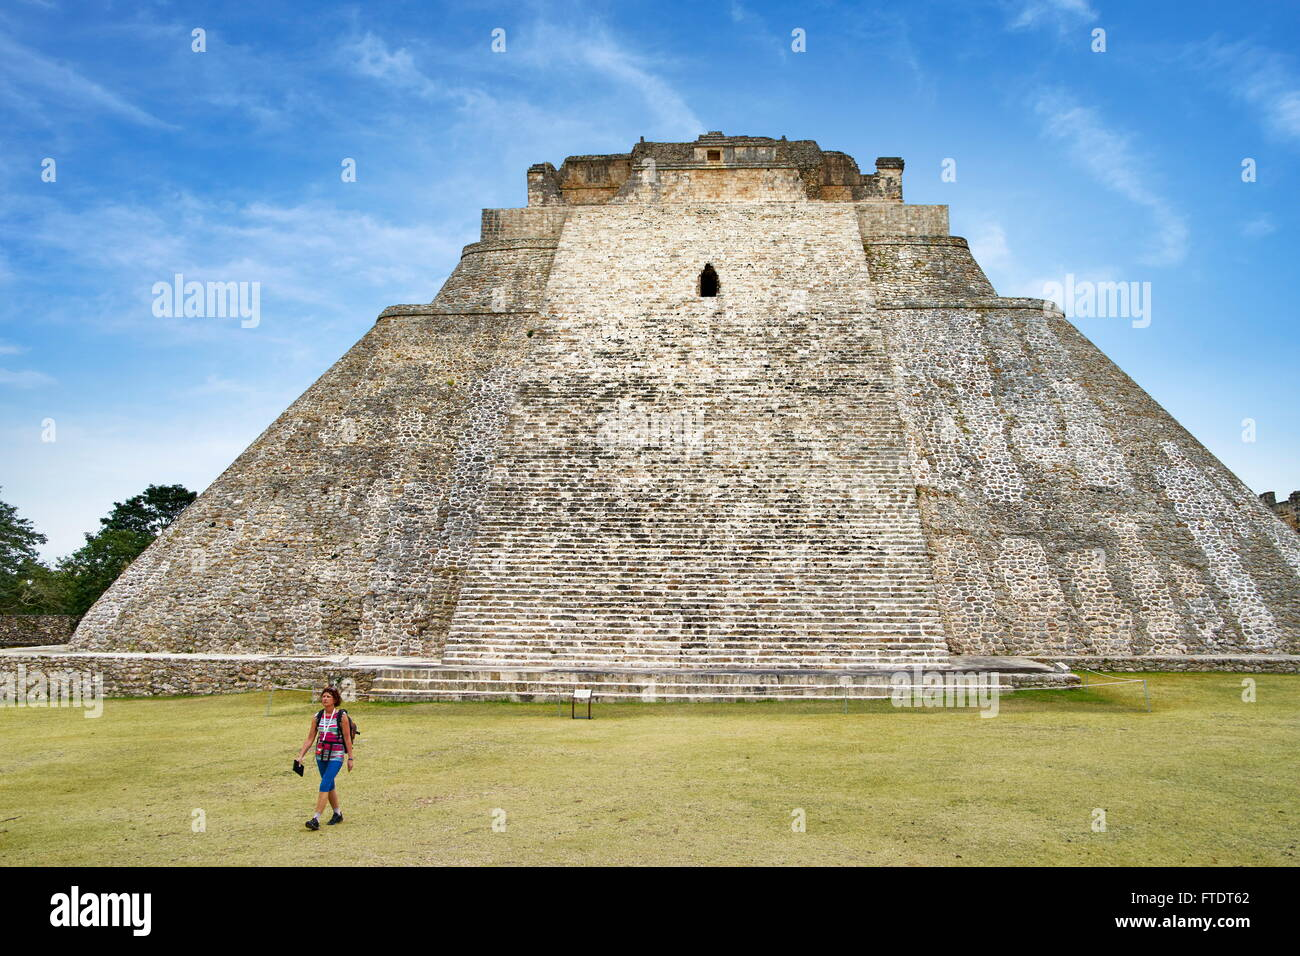 Pyramid of the Magician in Uxmal, Yucatan, Mexico UNESCO - Stock Image